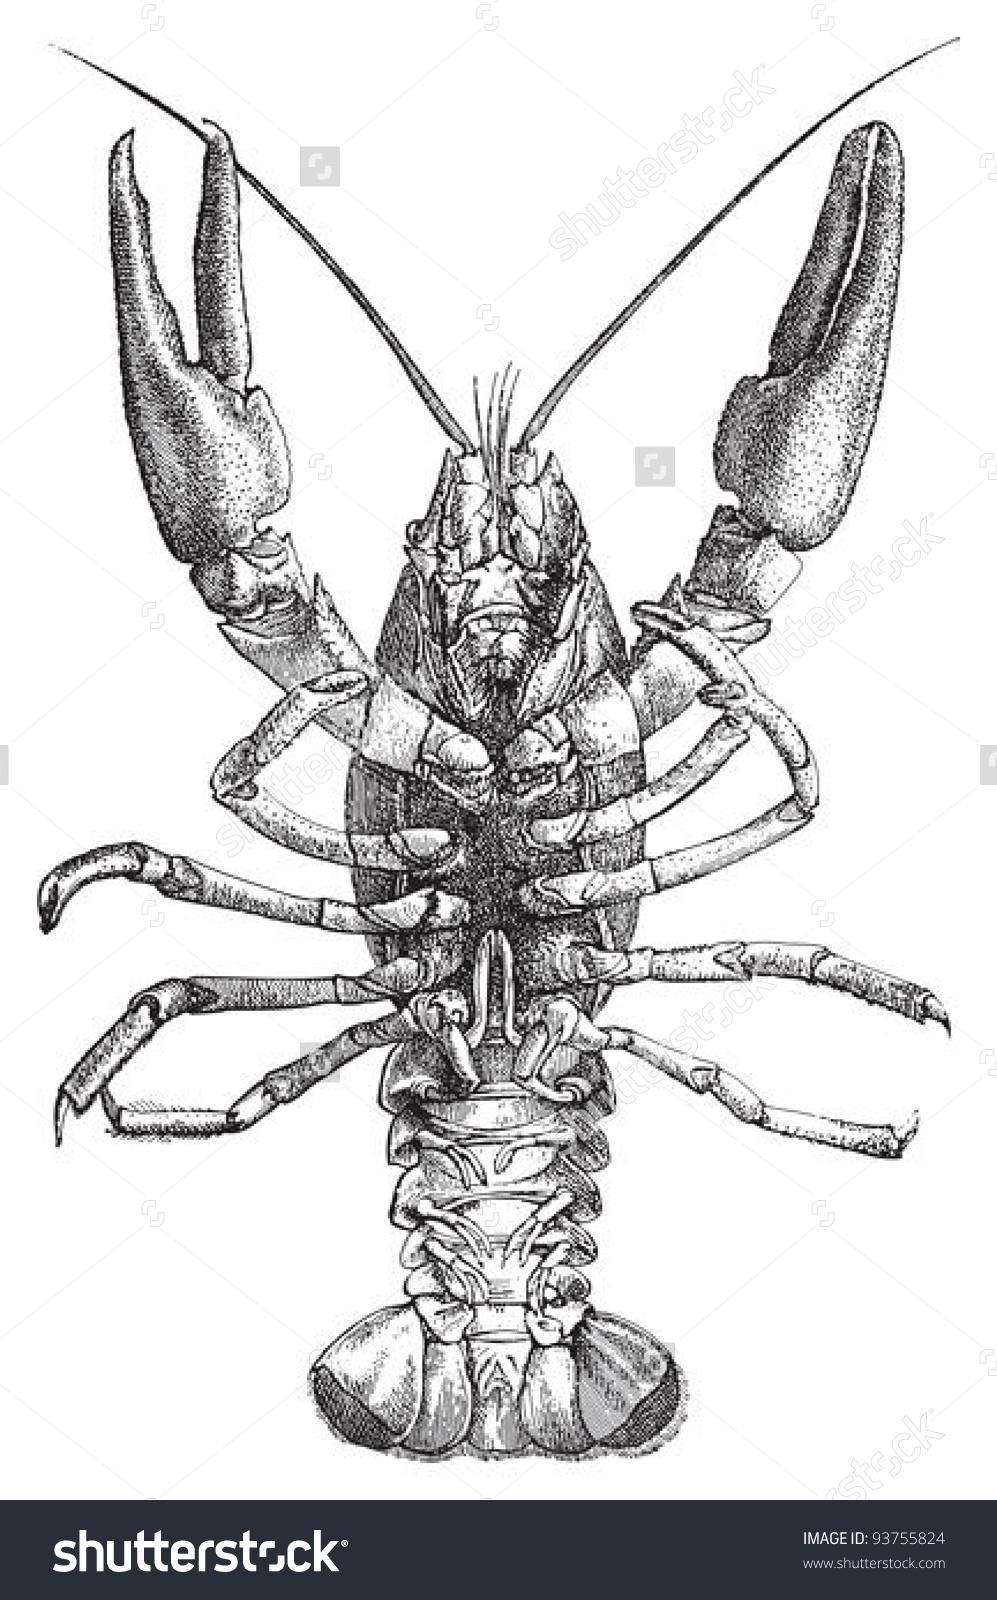 European Crayfish Astacus Fluviatilis Vintage Illustration Stock.